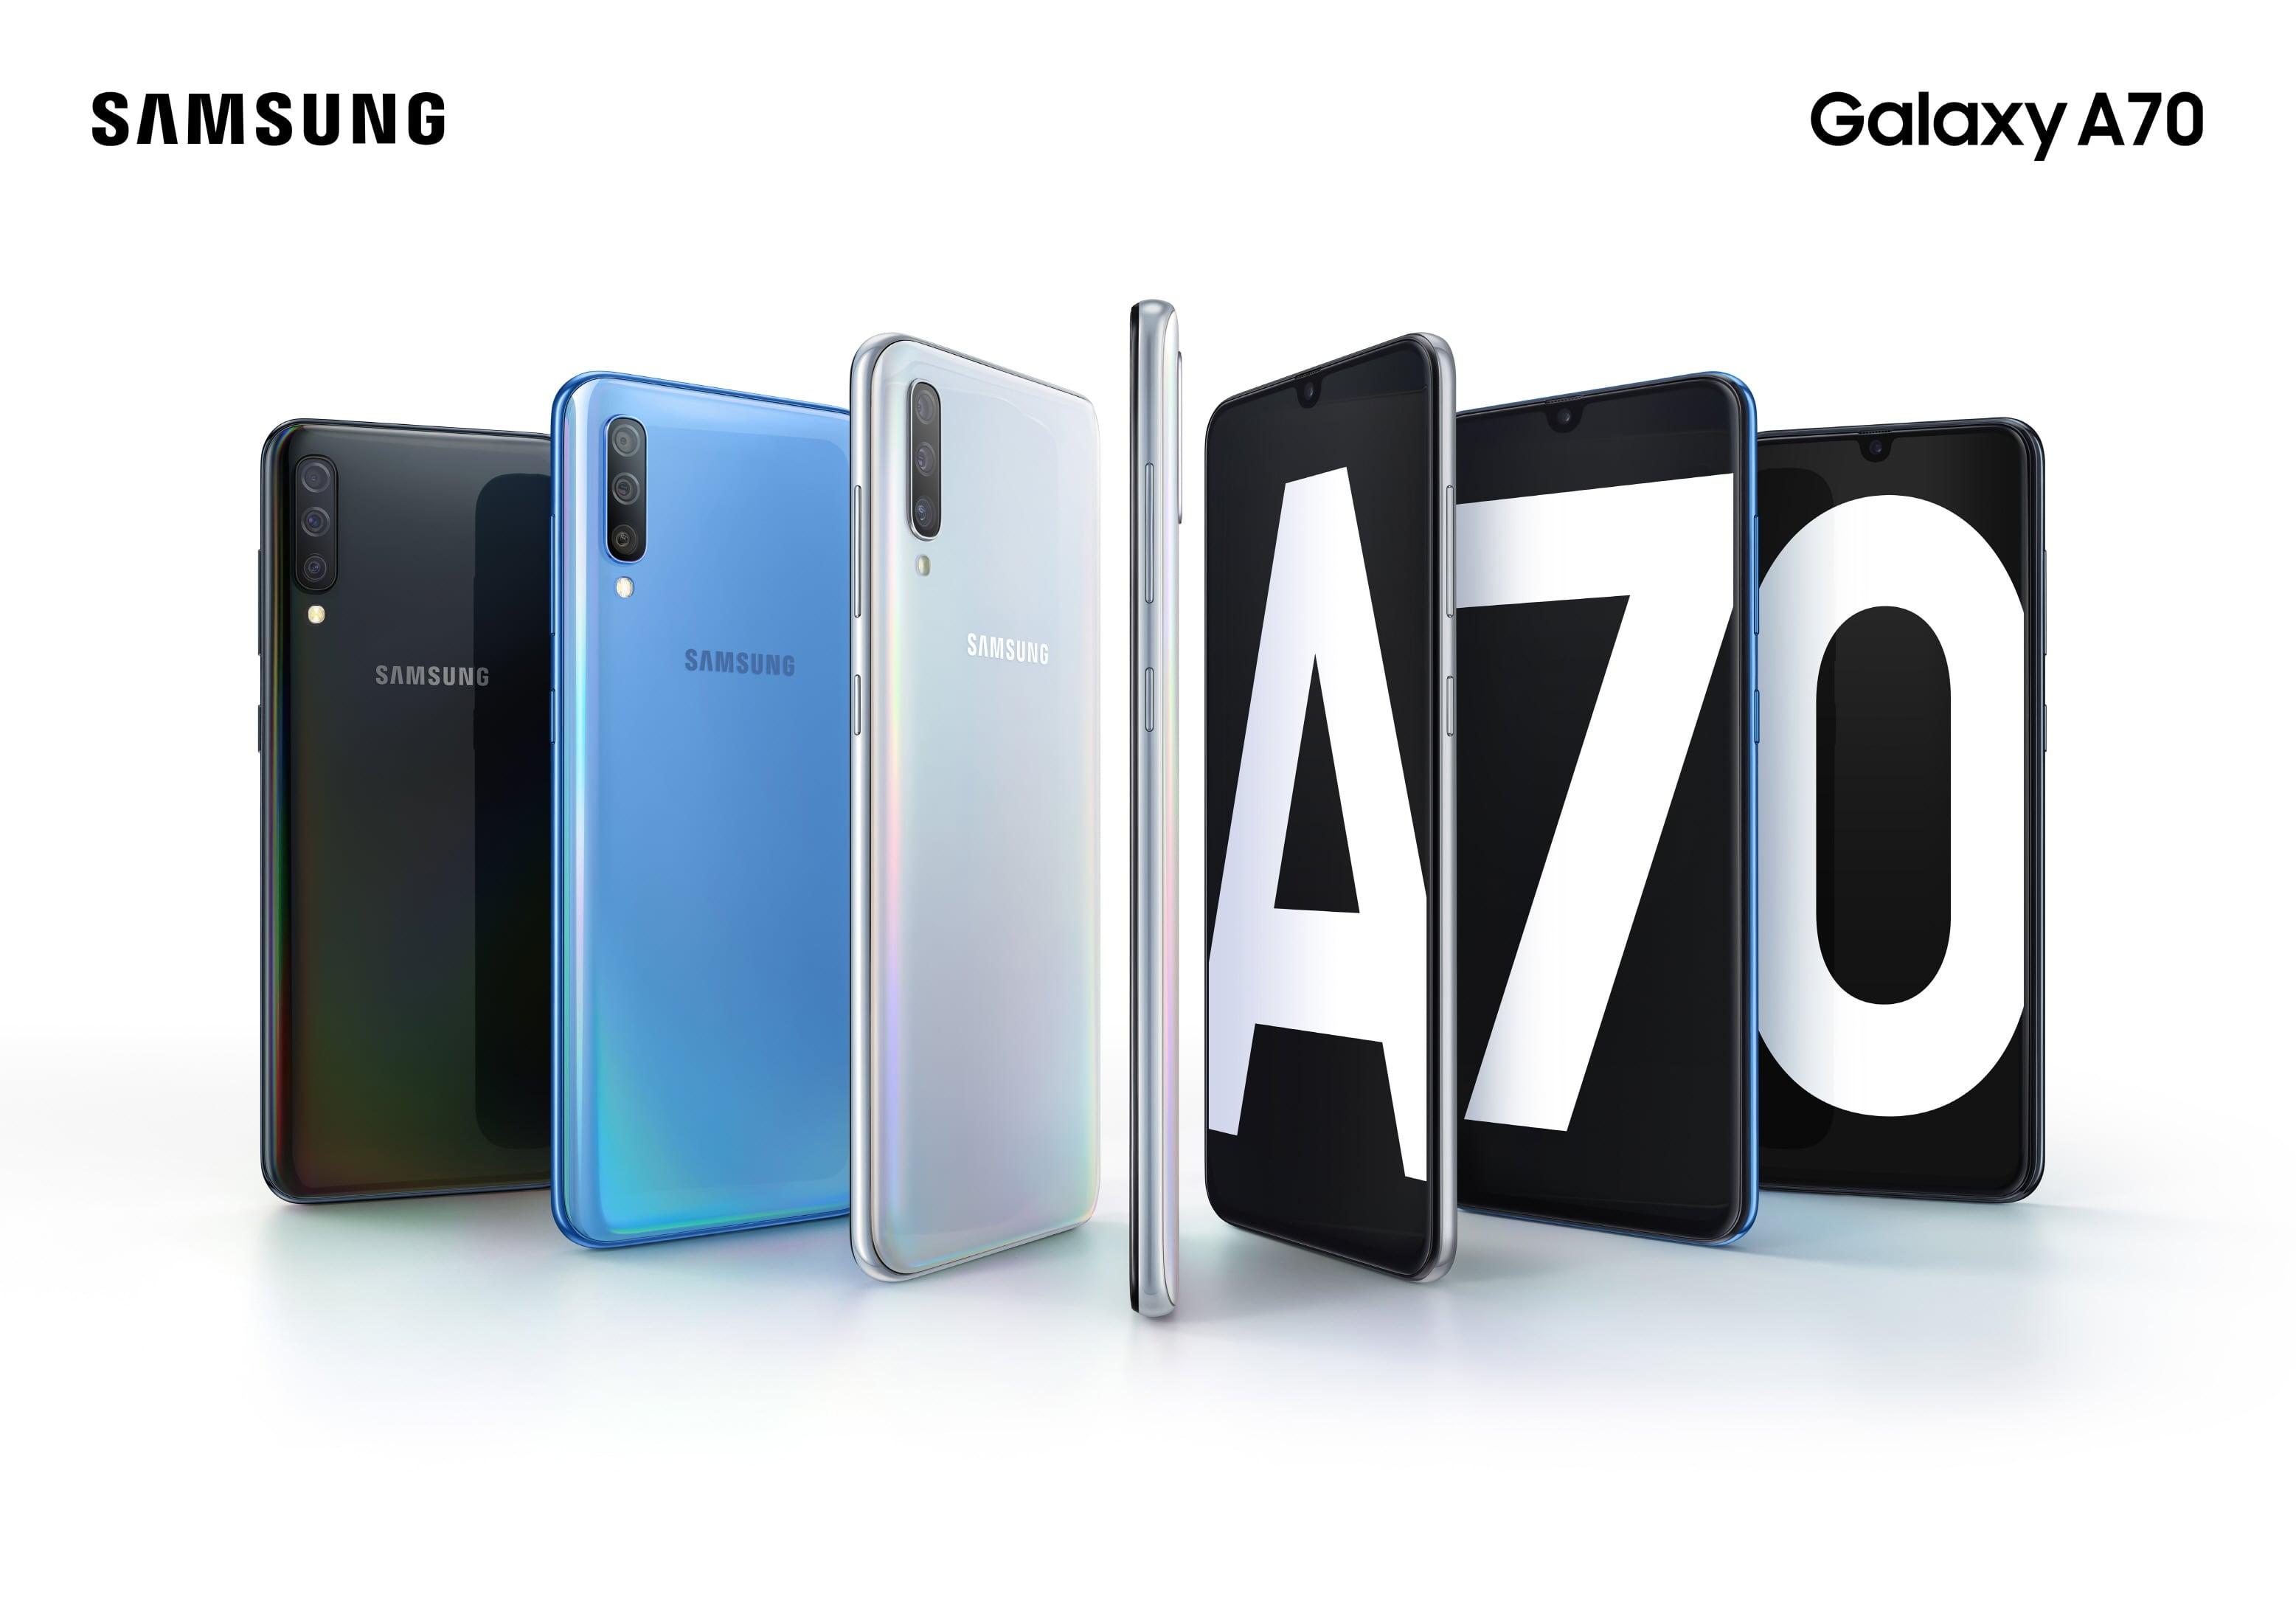 Samsung Galaxy A70 smartphone